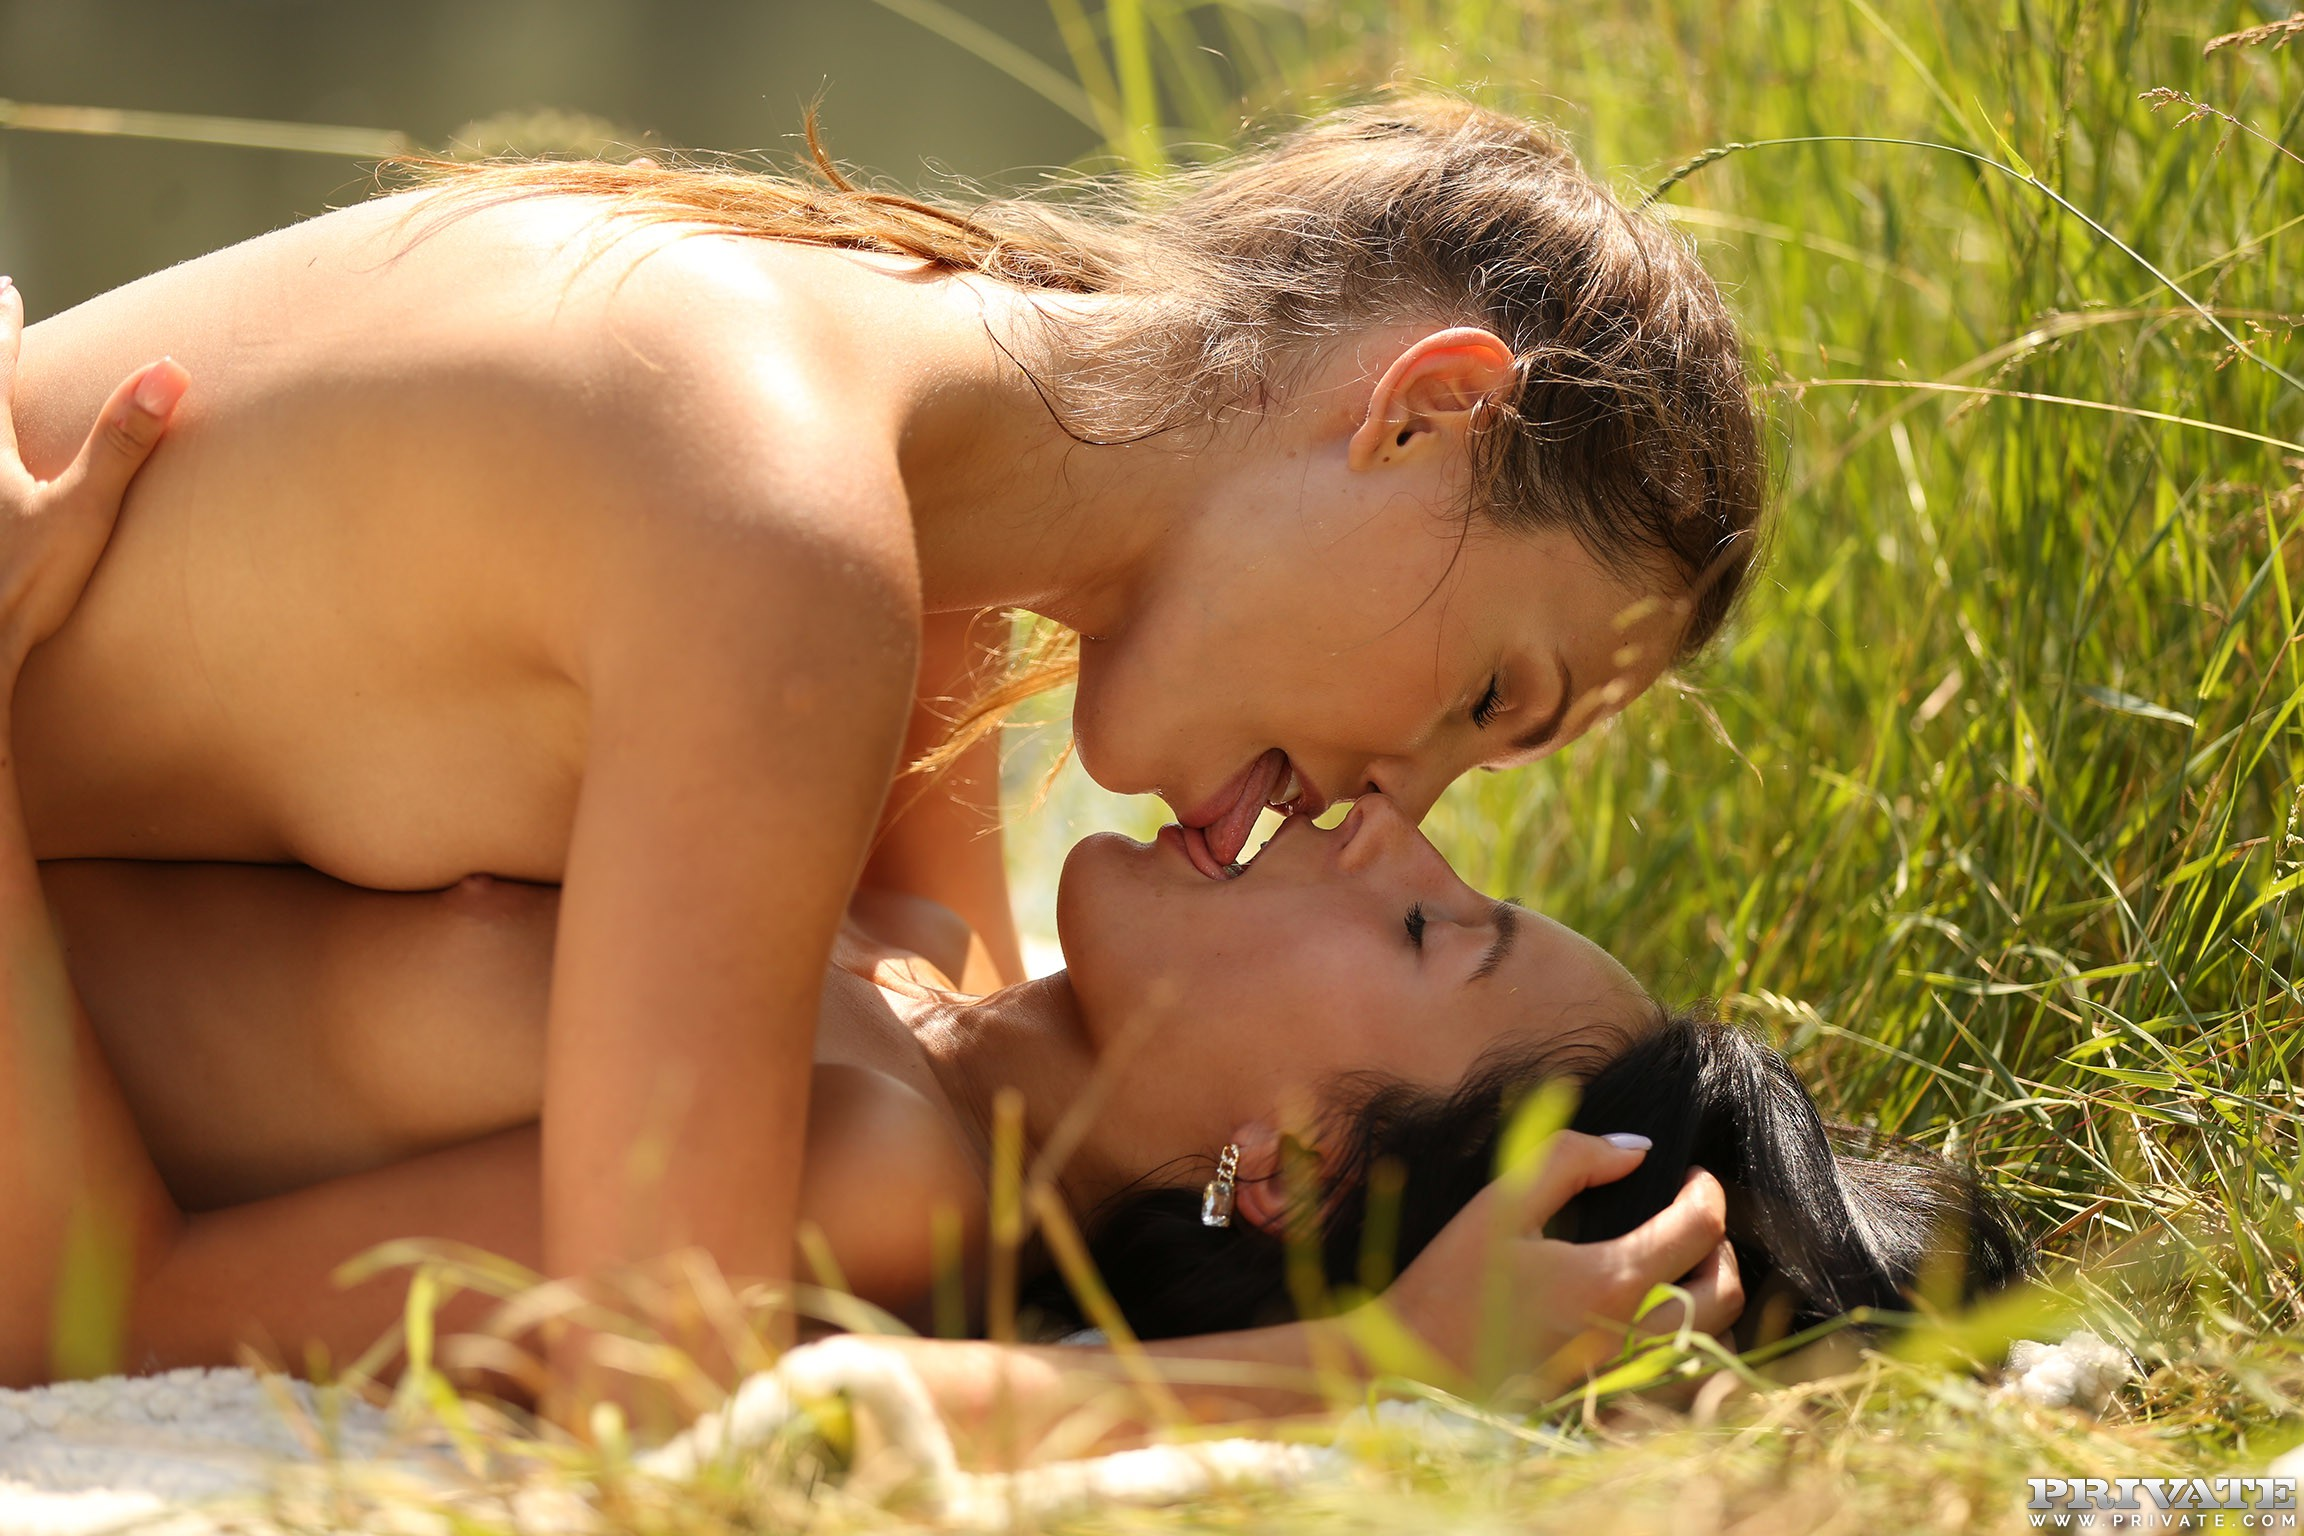 Hairy teen lesbians wild girl girl